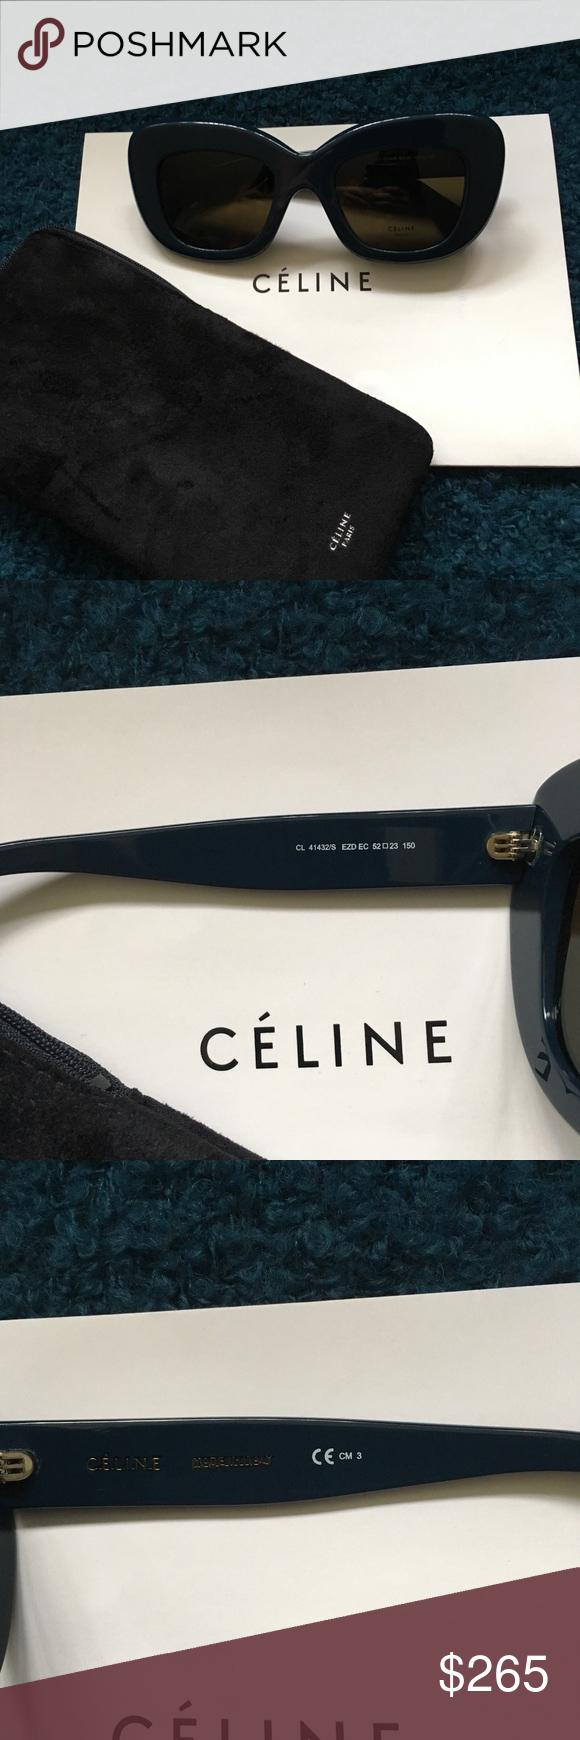 7157a52798 Celine CL 41432 S • Diane • Petrol (Dark Blue) New Never Worn ...